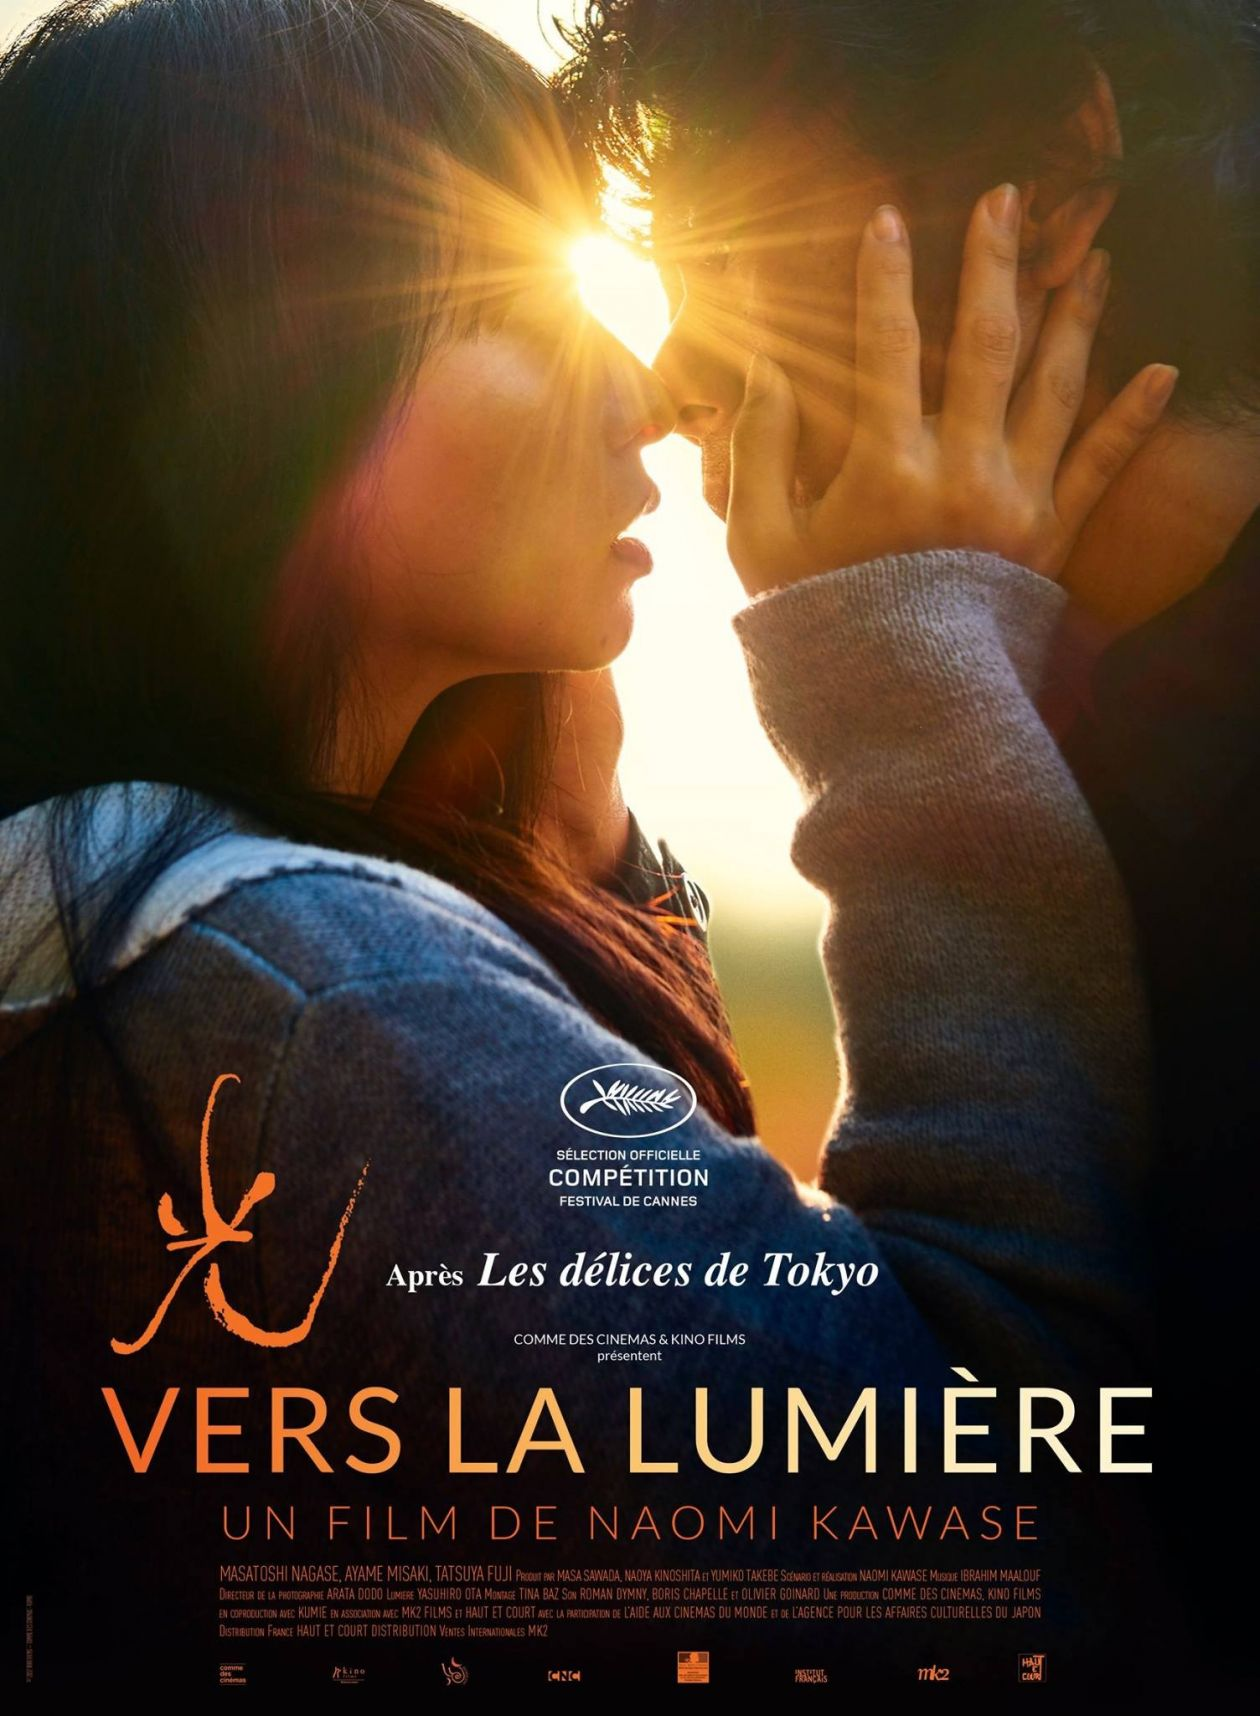 Ayame Misaki Japanese actress | Hikari / Radiance / Vers la lumière / Naomi Kawase 2017 Movie Poster Affiche film